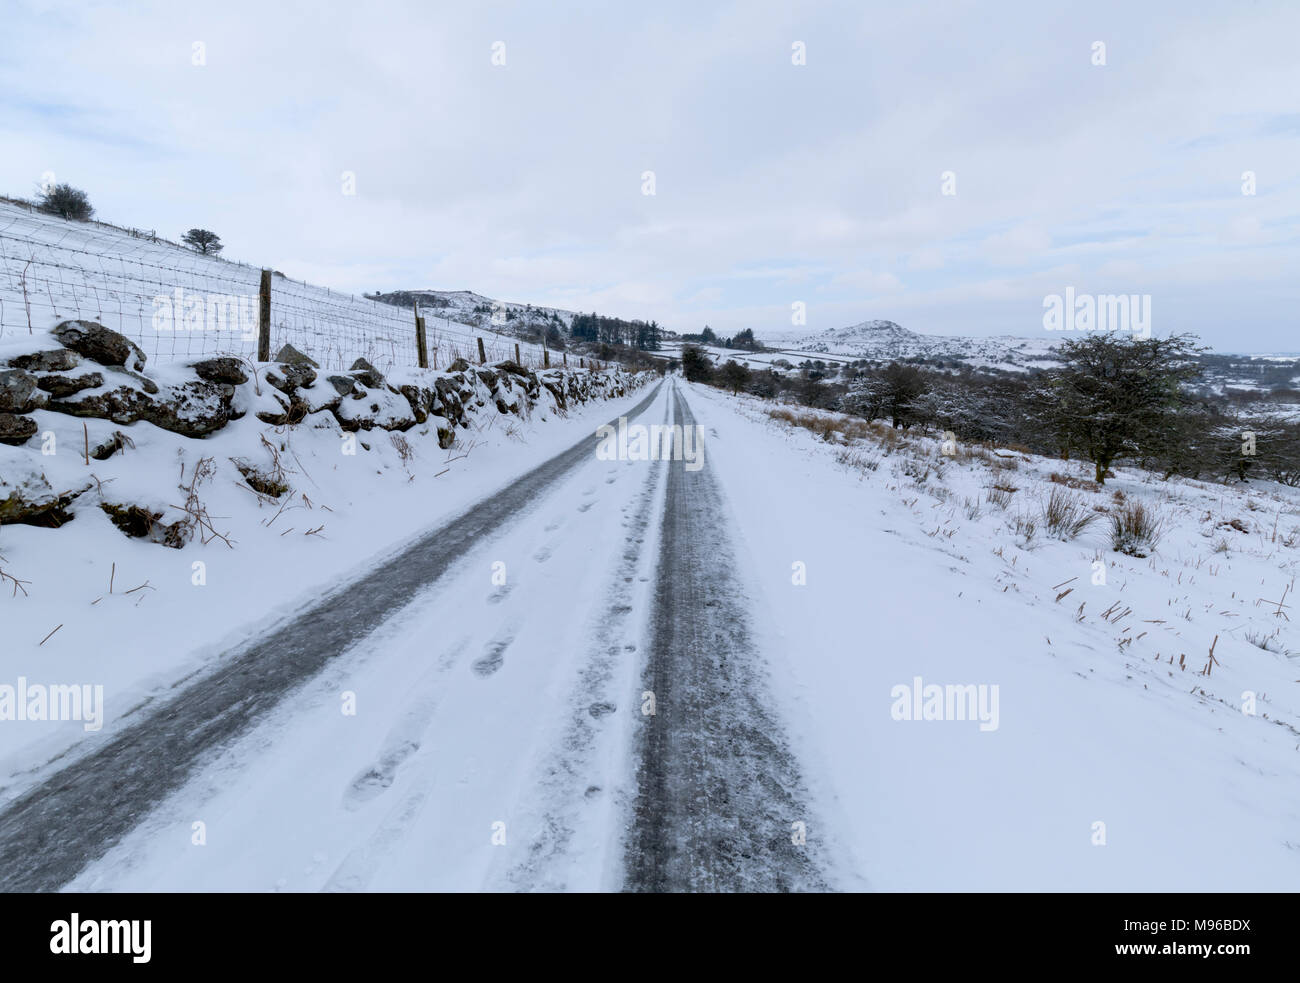 Moorland road between Minions and Henwood on Bodmin Moor - Stock Image